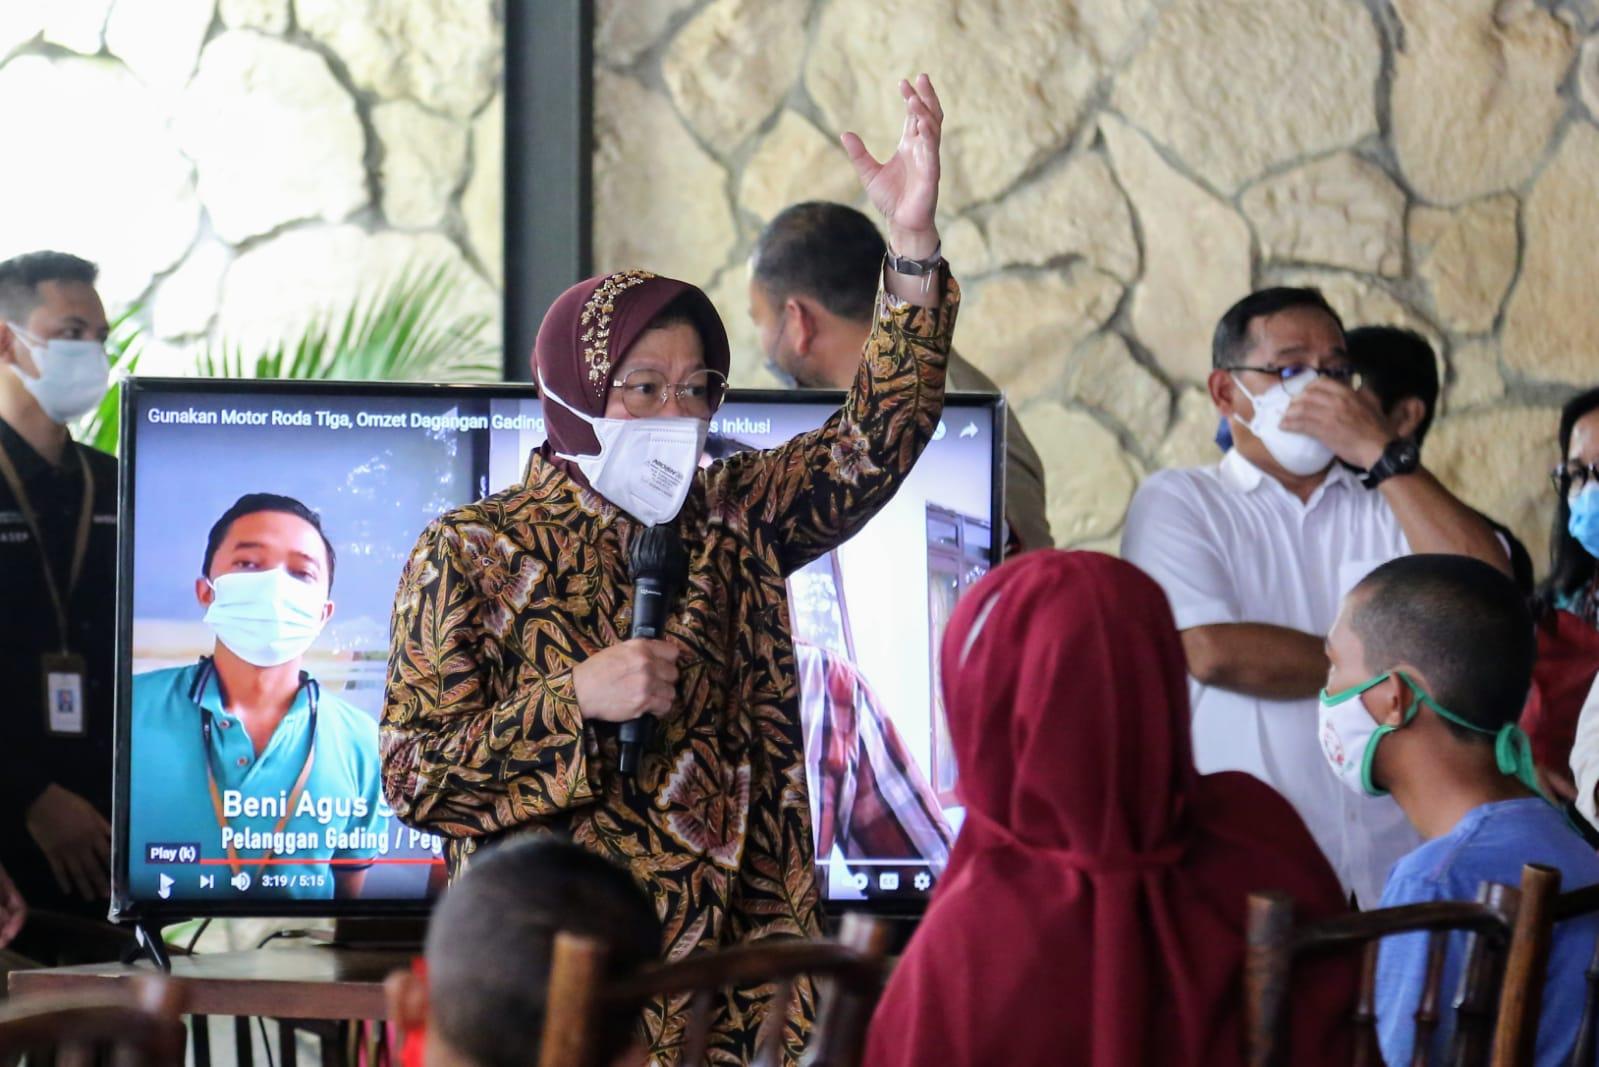 Kemensos Serahkan Berbagai Bantuan bagi Masyarakat di Gorontalo